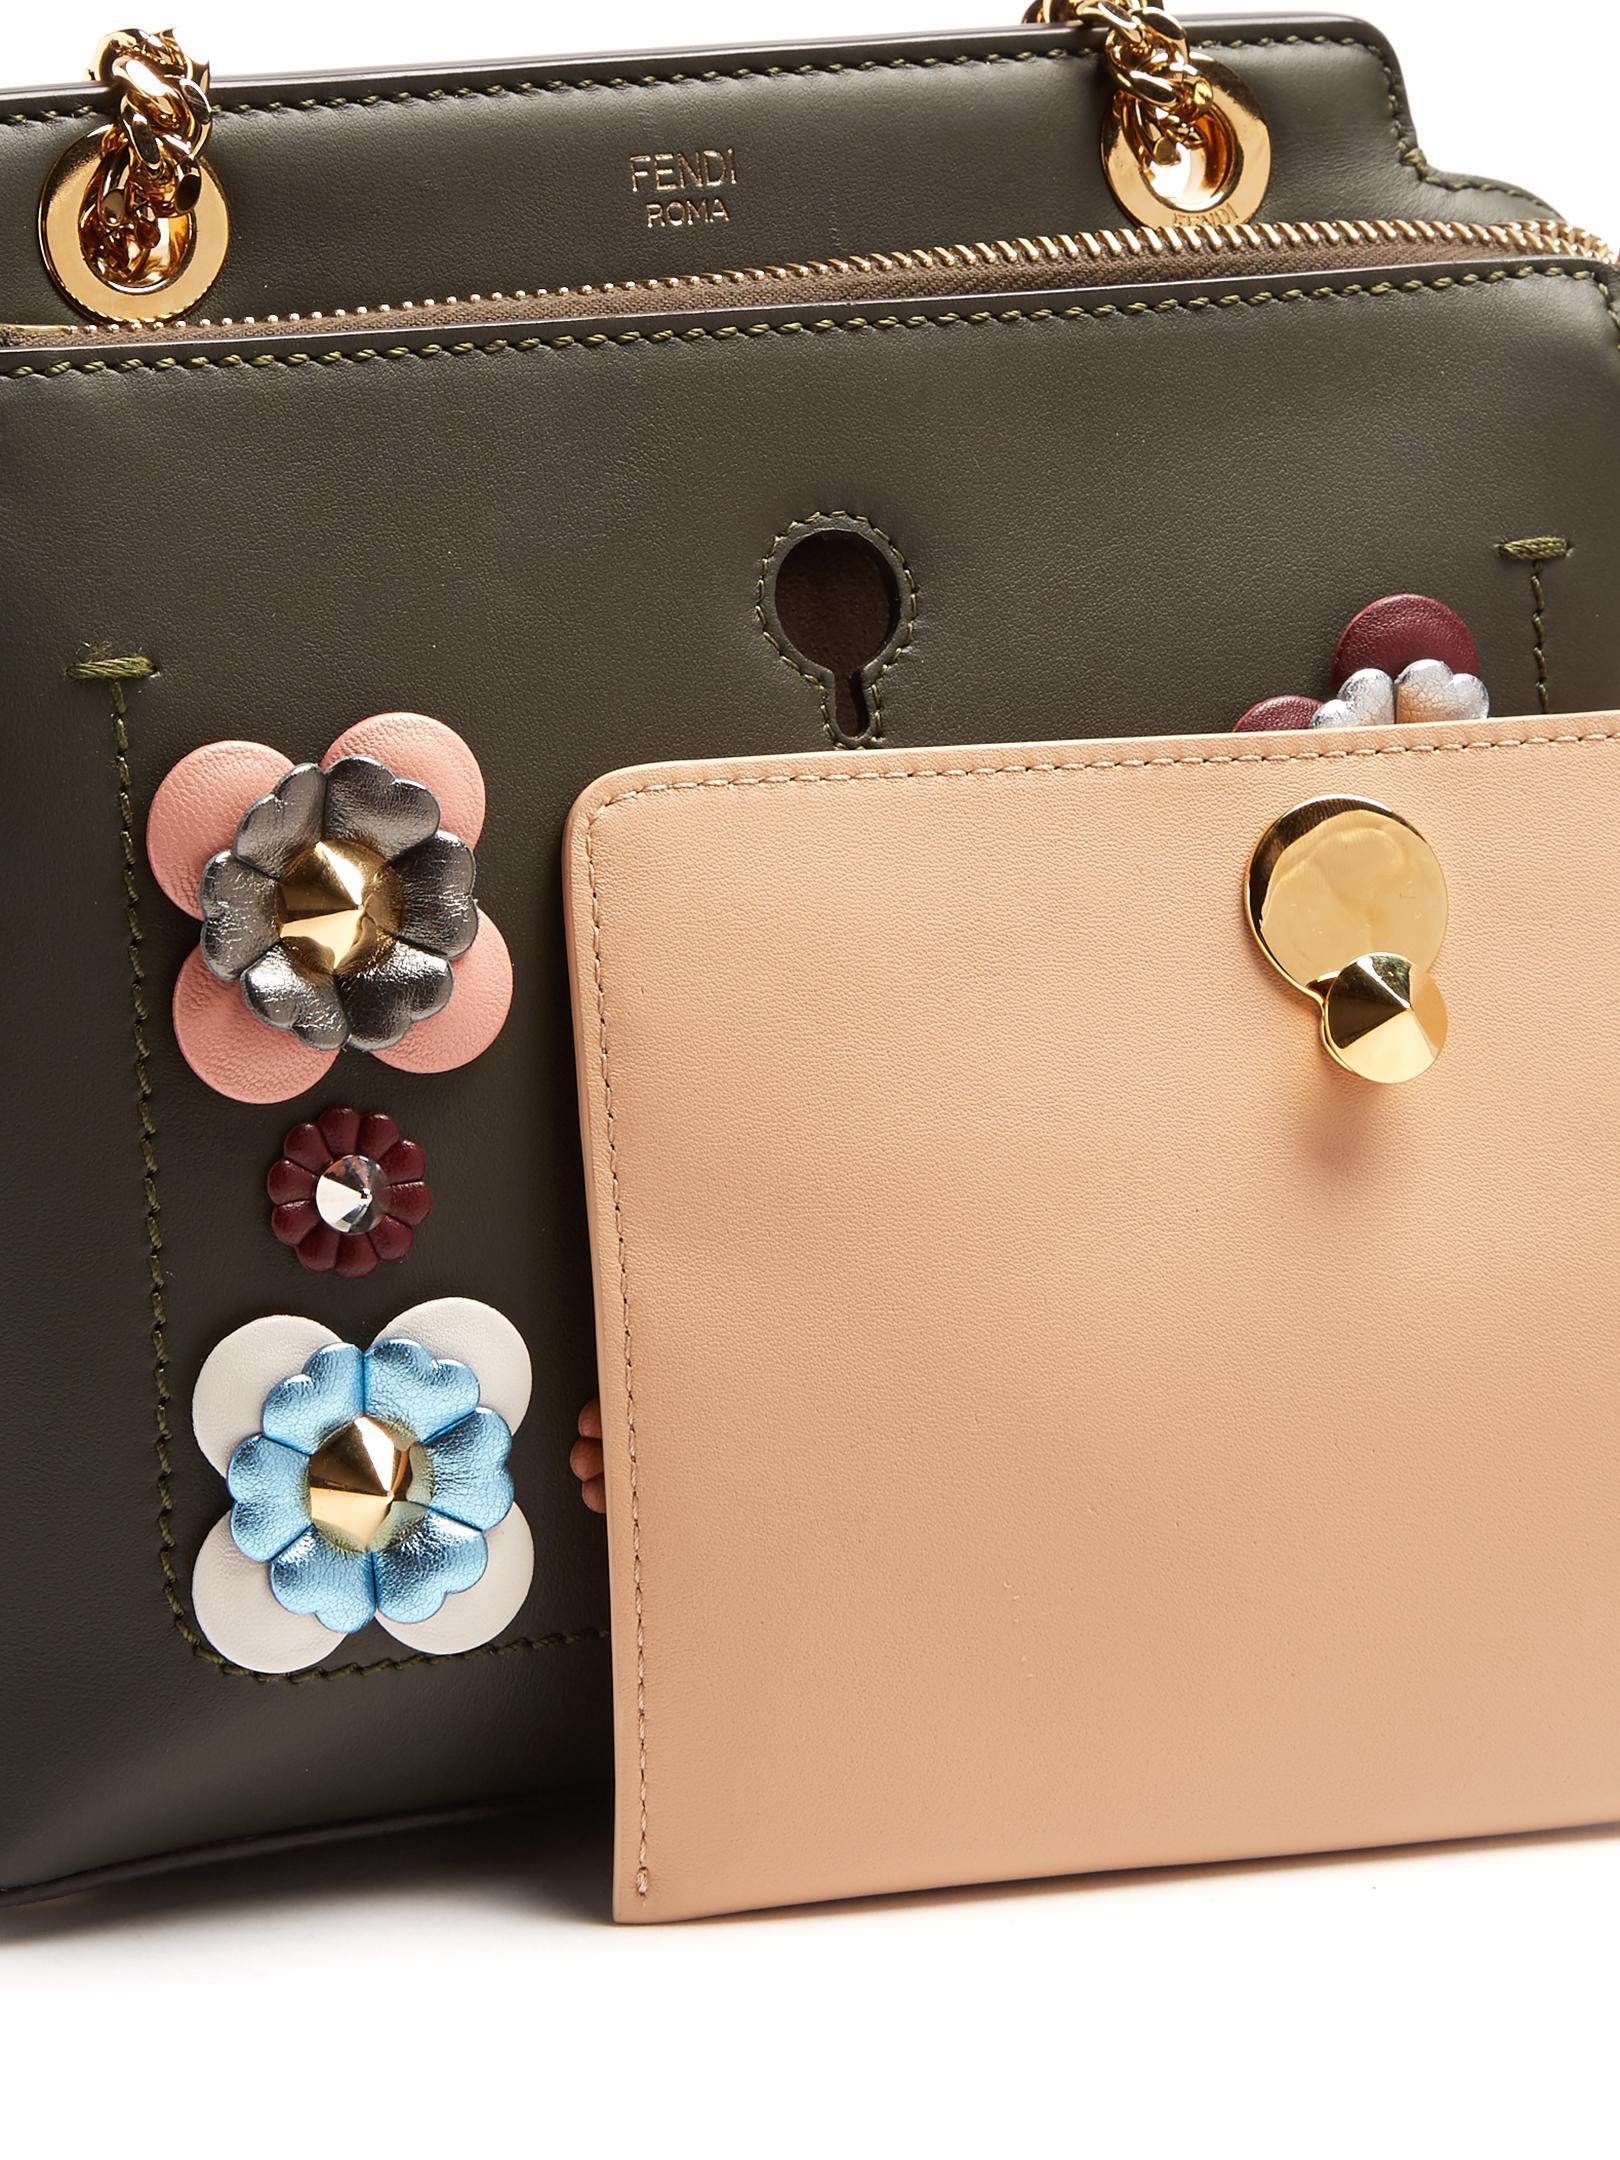 86f467c15bbb Lyst - Fendi Dotcom Small Flower-appliqué Leather Bag in Green